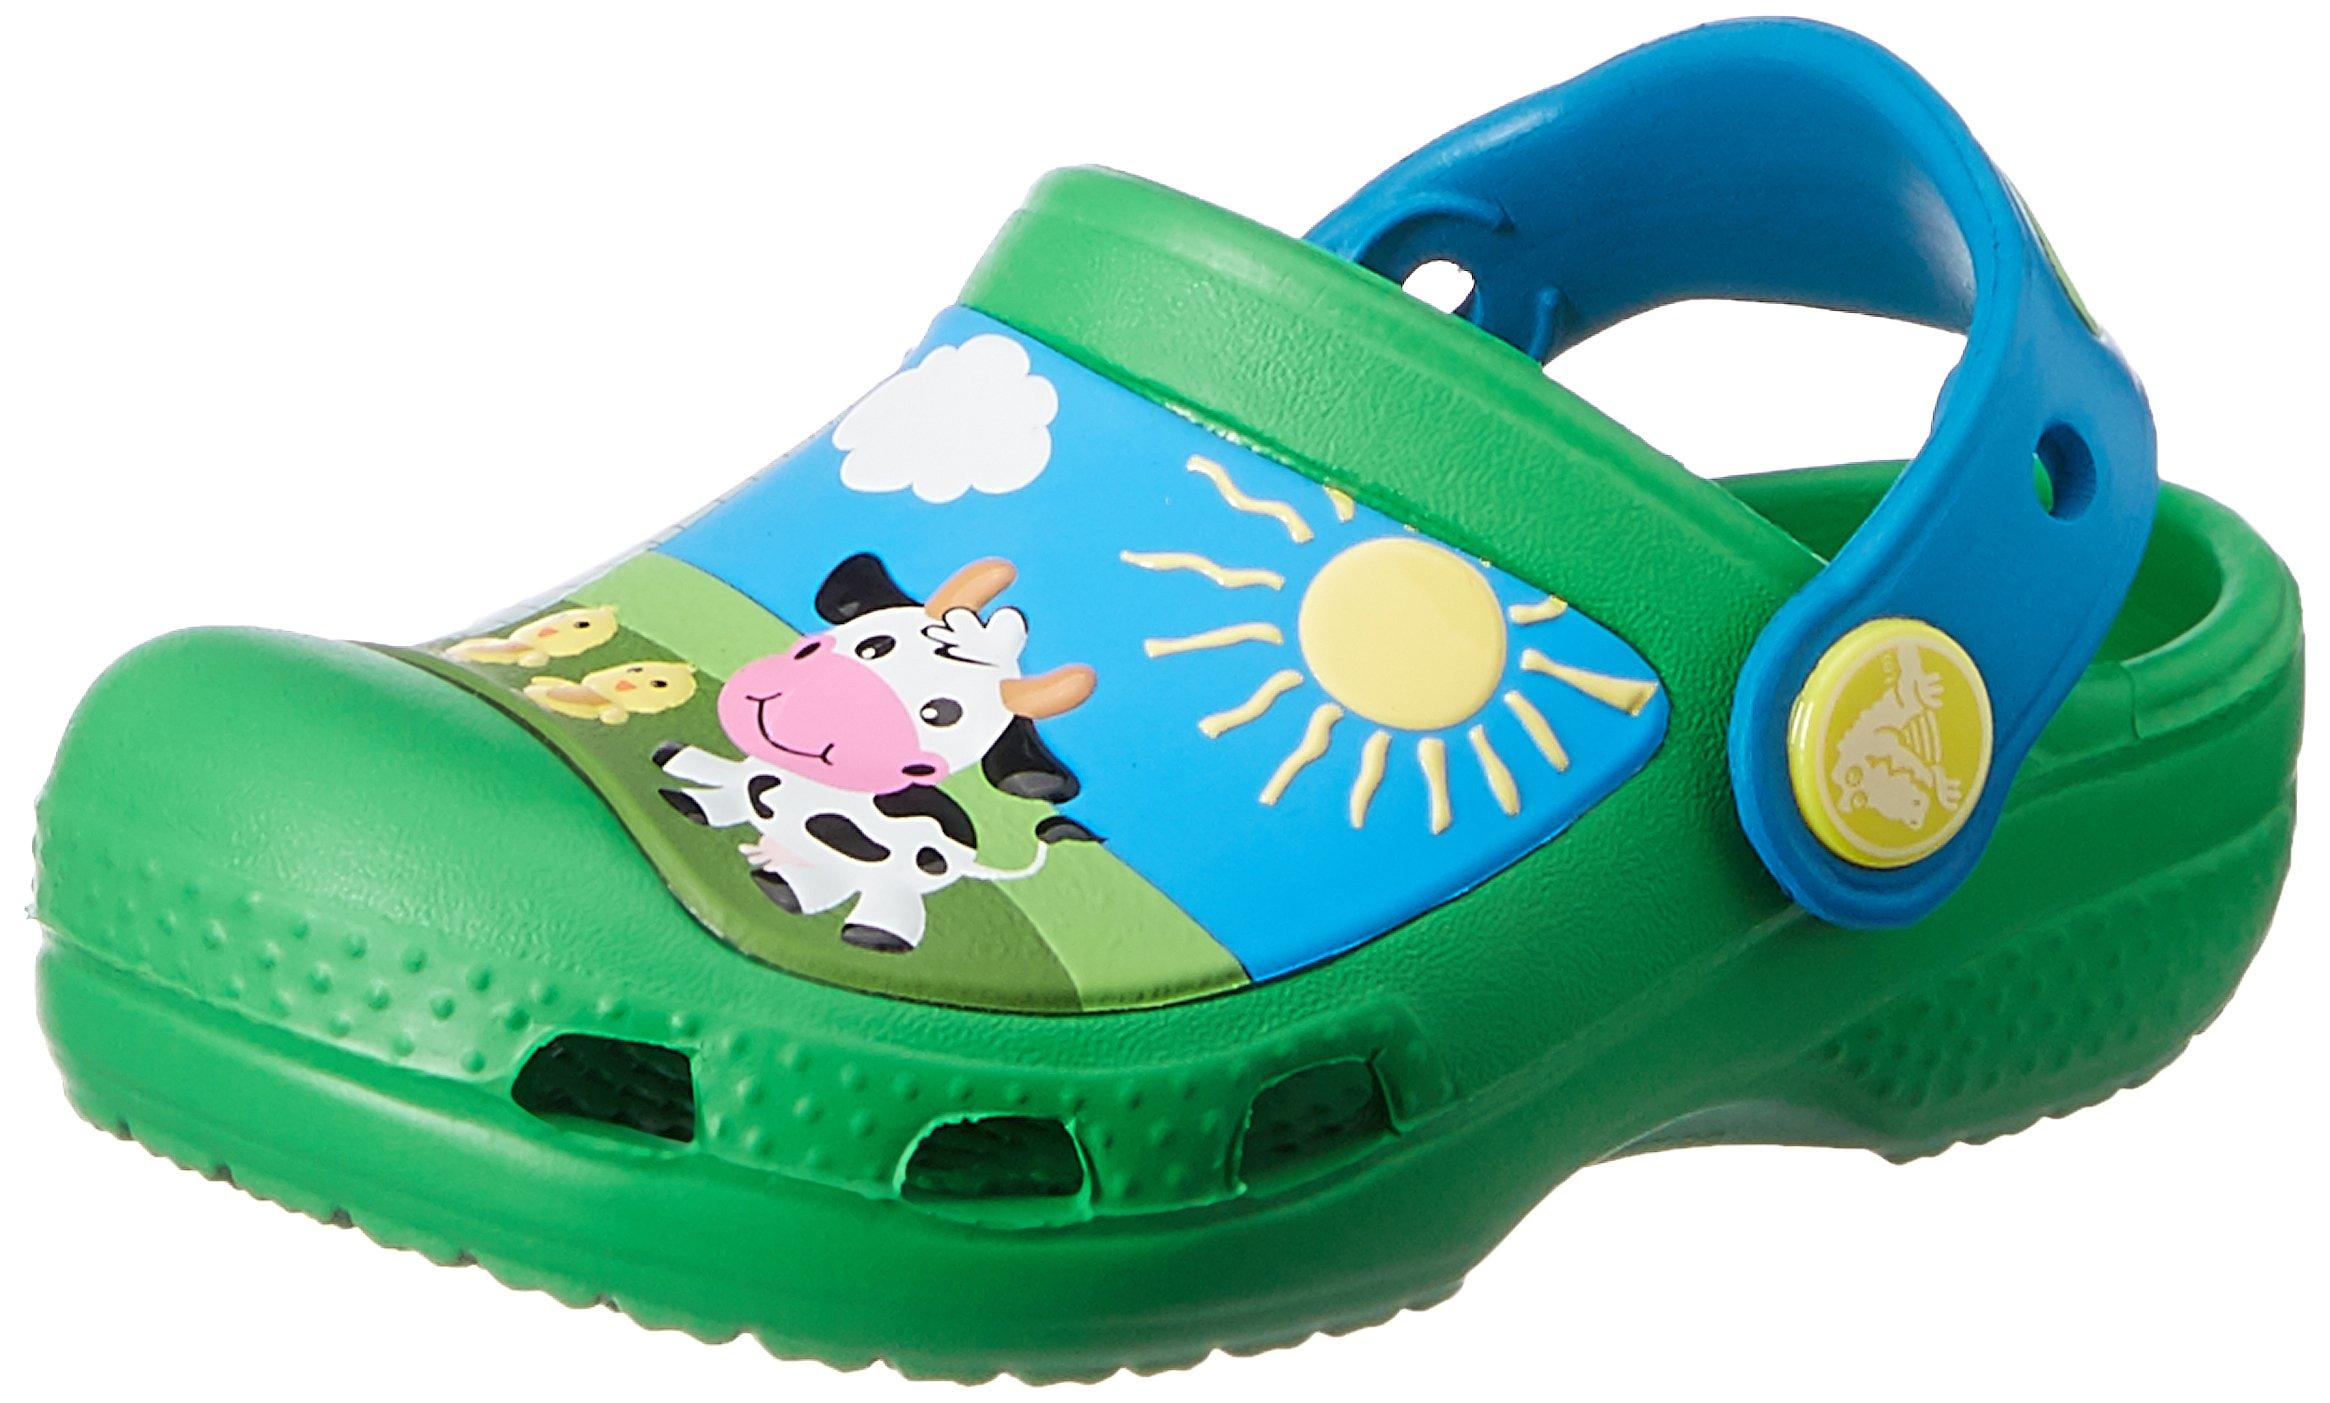 Crocs Creative Barnyard Clog (Toddler/Little Kid), Grass Green, 6/7 M US Toddler